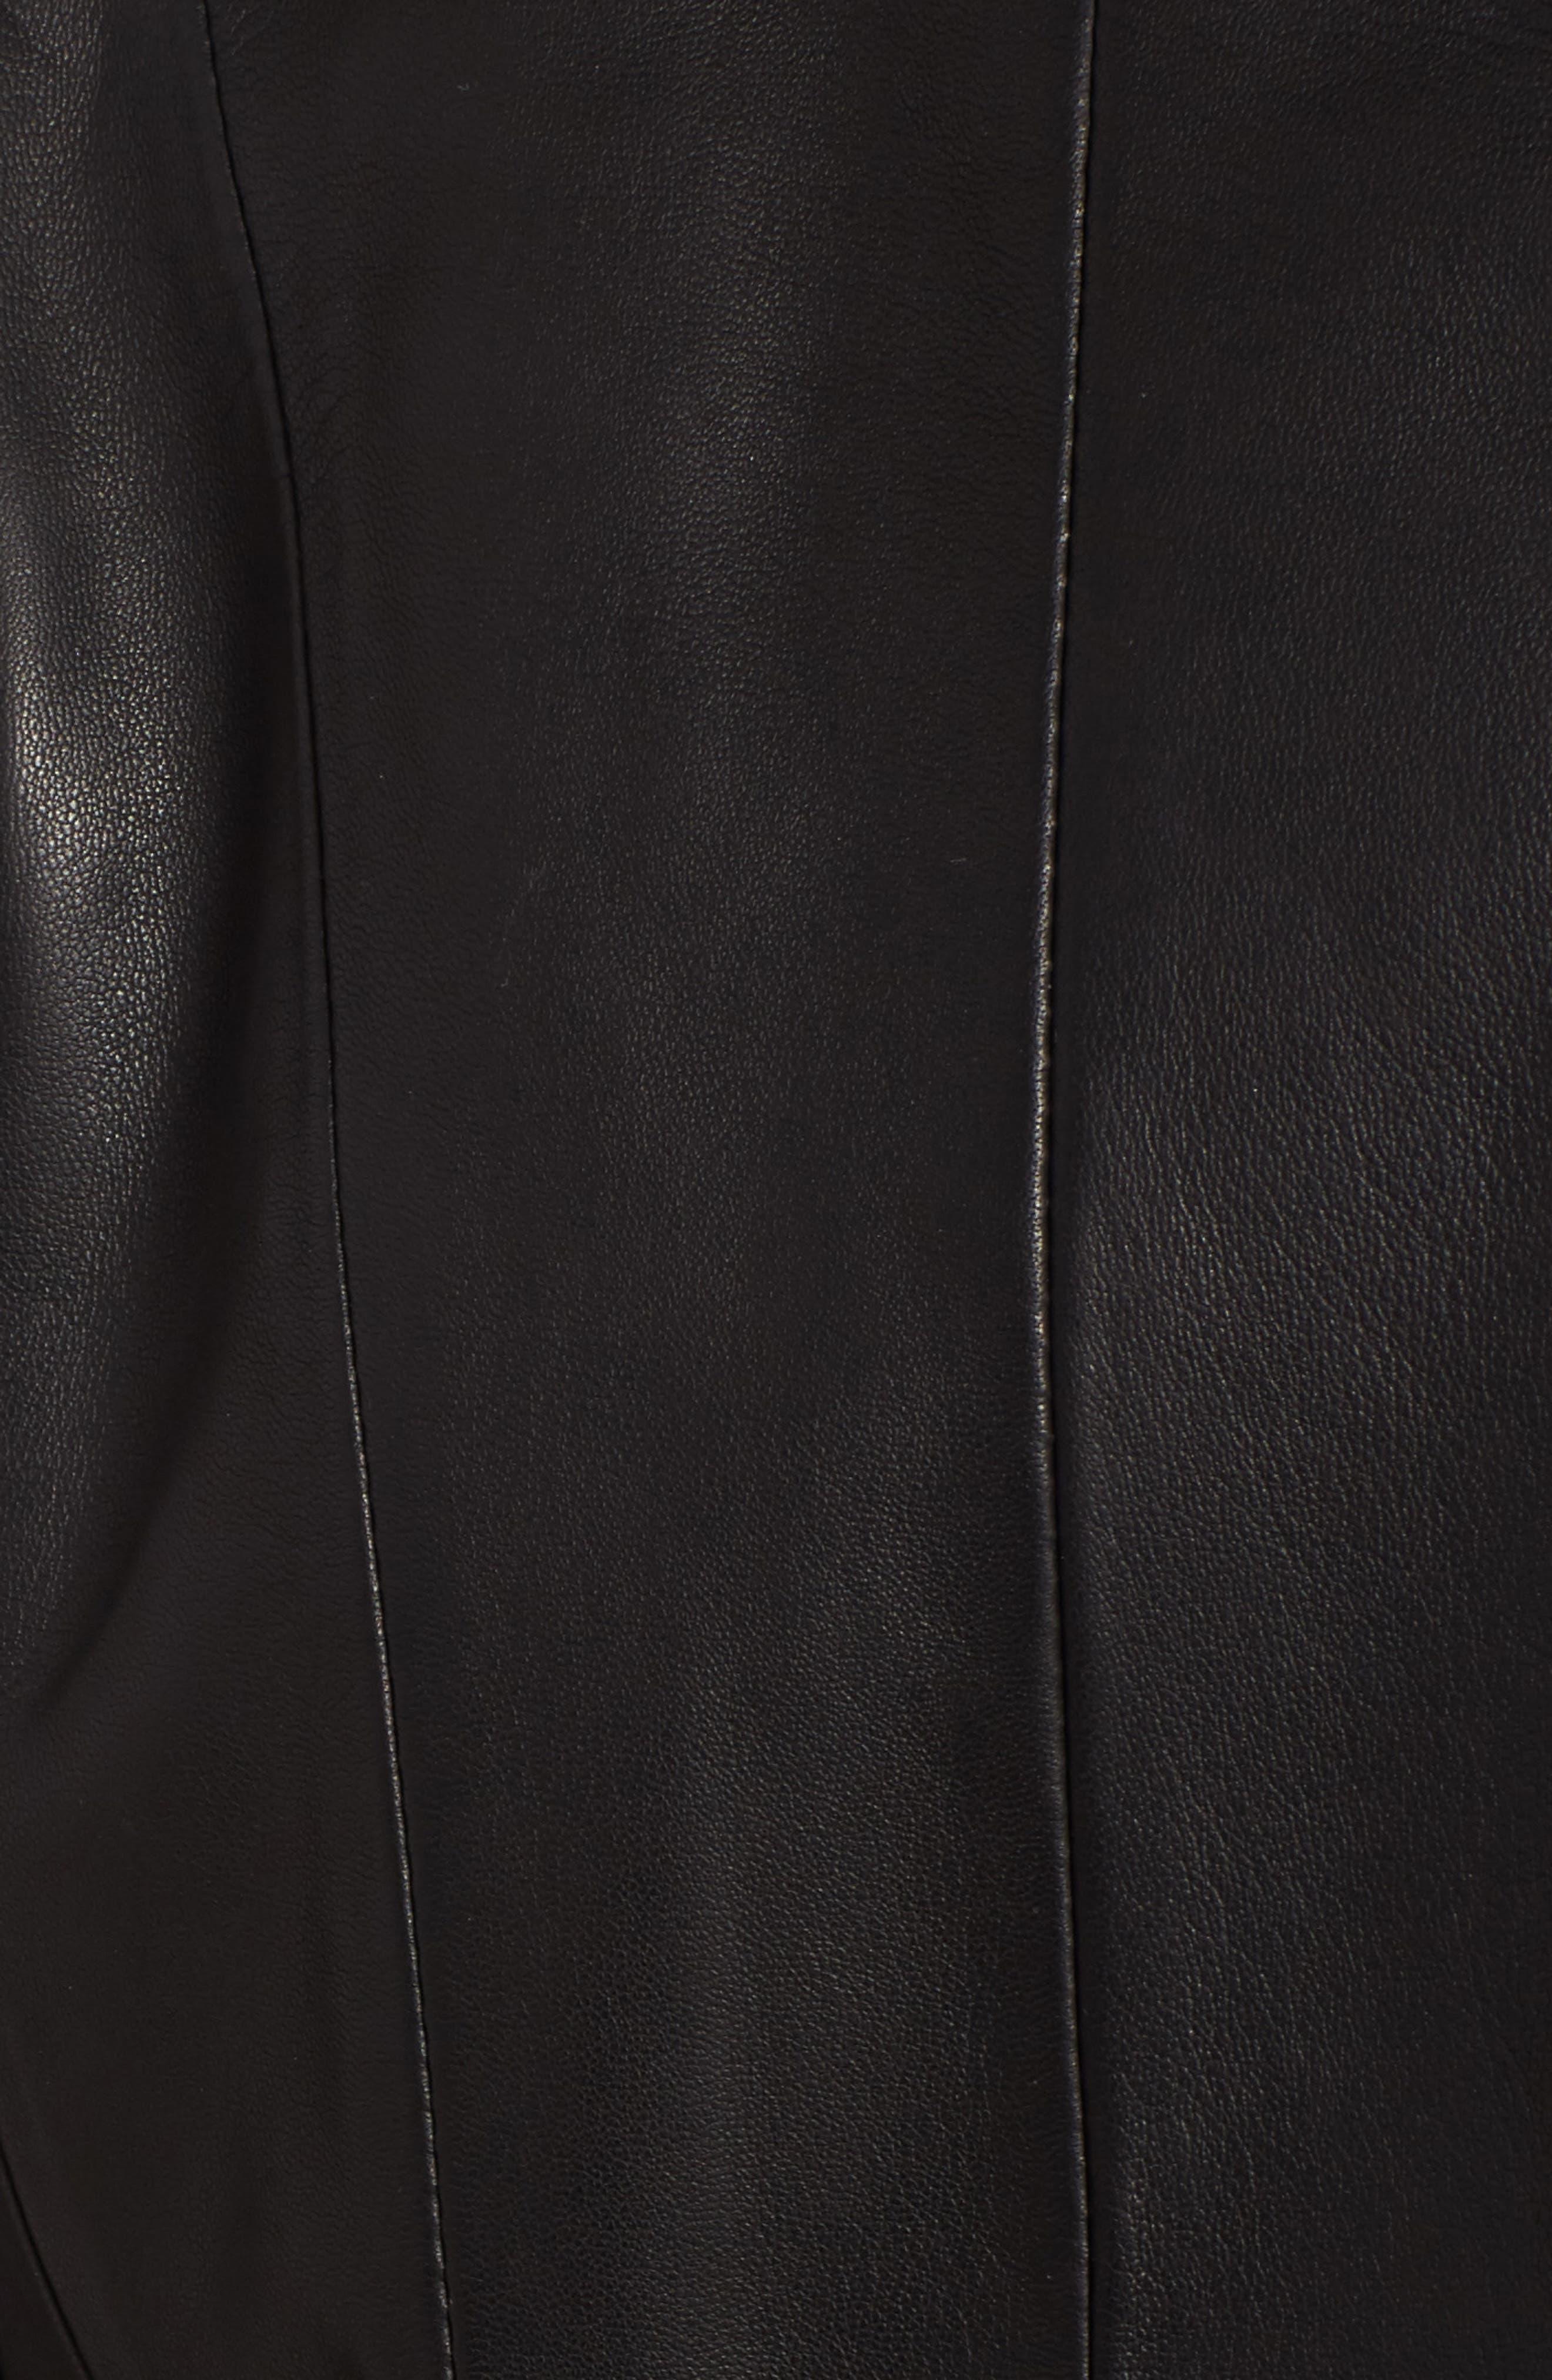 Leather Car Coat,                             Alternate thumbnail 6, color,                             001